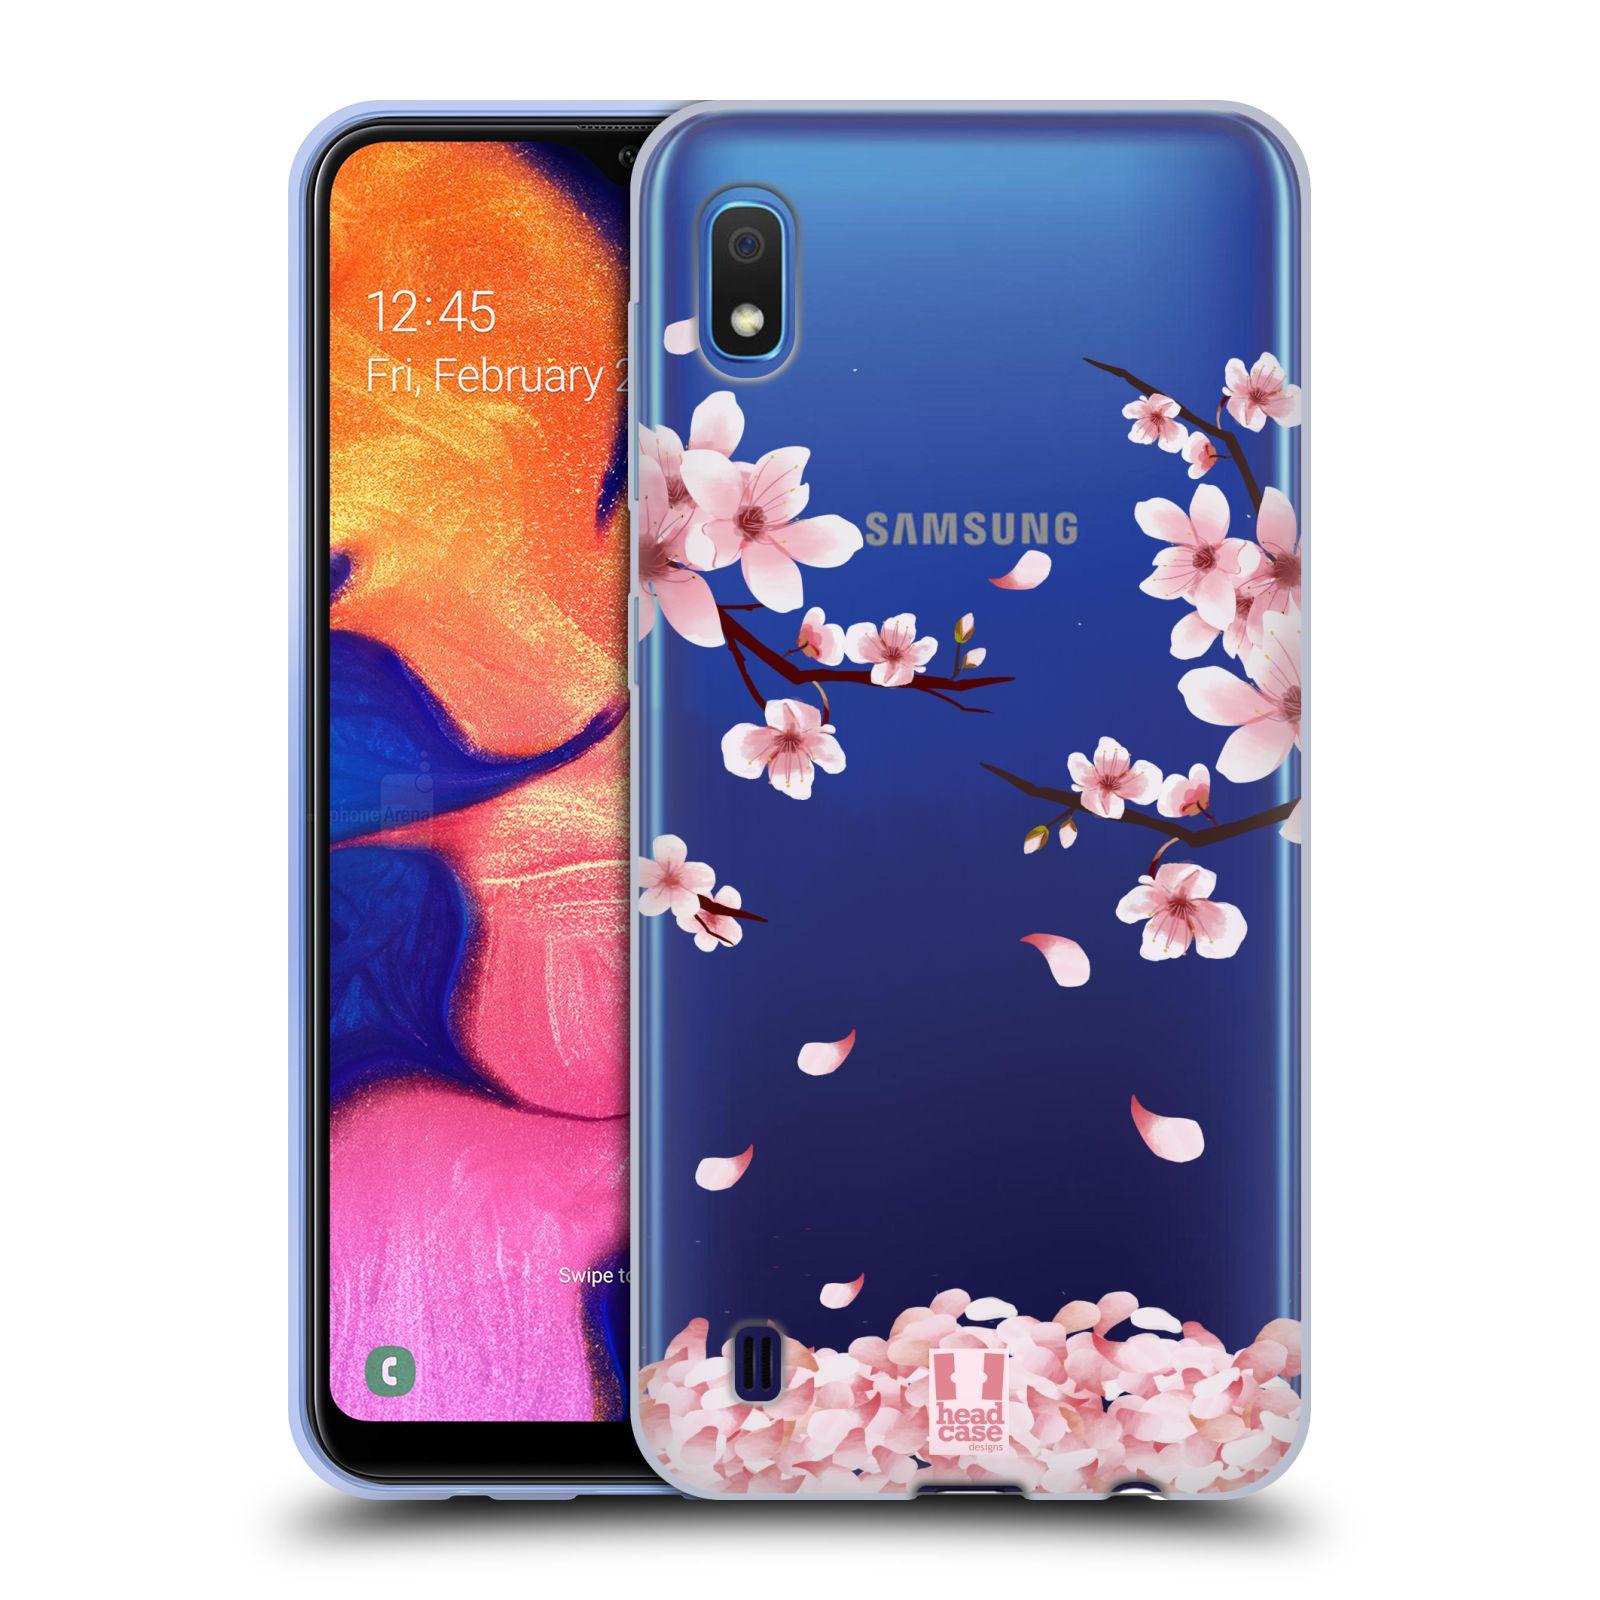 Silikonové pouzdro na mobil Samsung Galaxy A10 - Head Case - Květy a větvičky